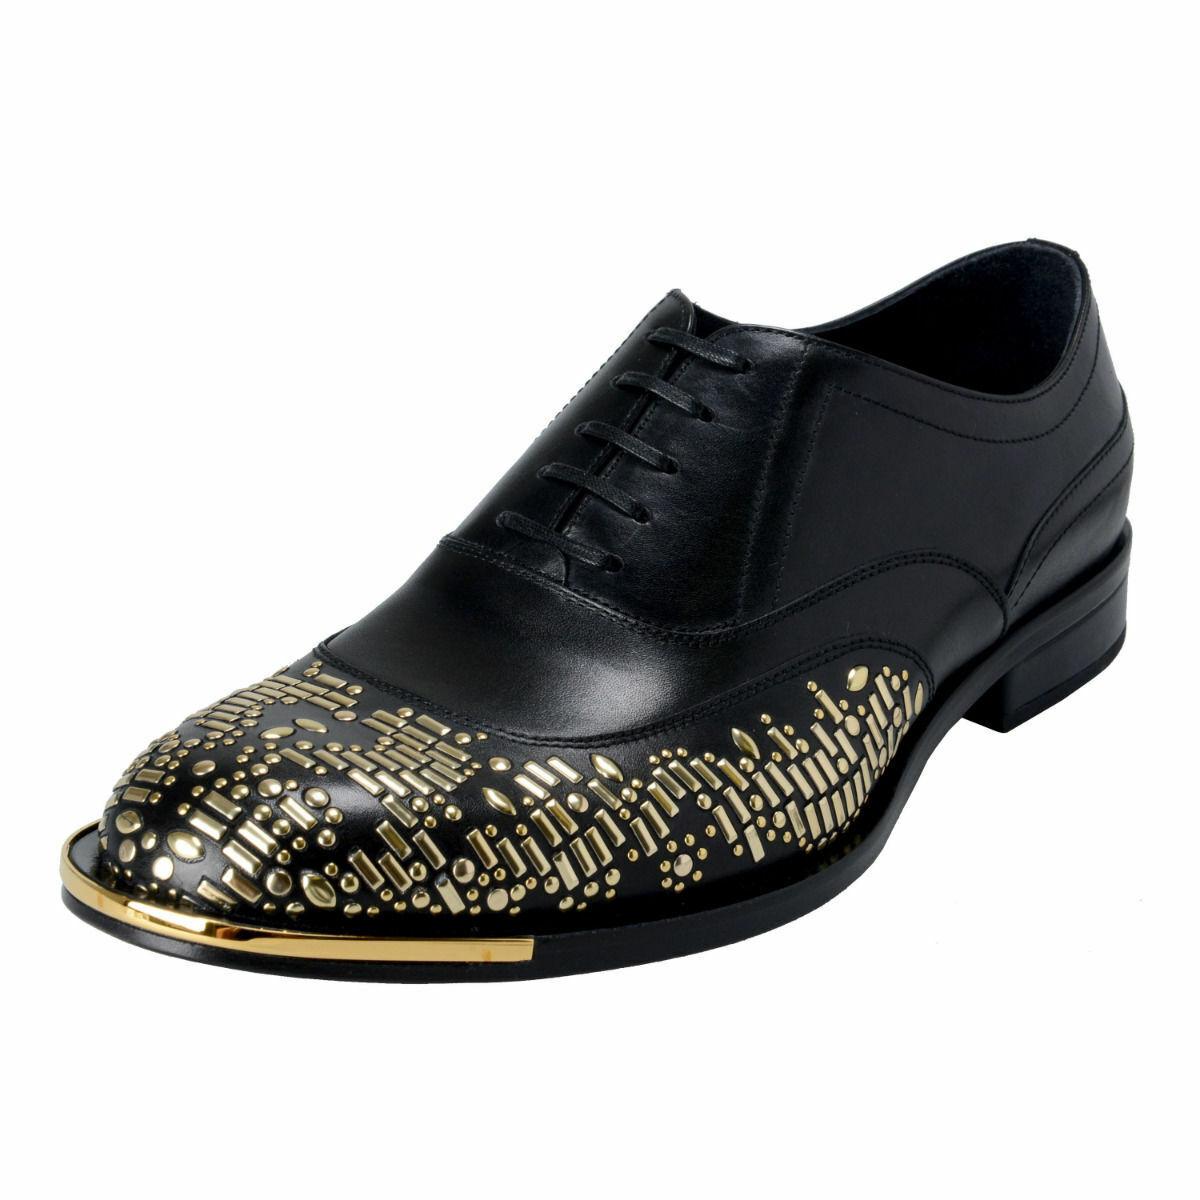 Versace Men's nero Beaded Lace Up Oxfords scarpe Sz 7 8 8.5 9